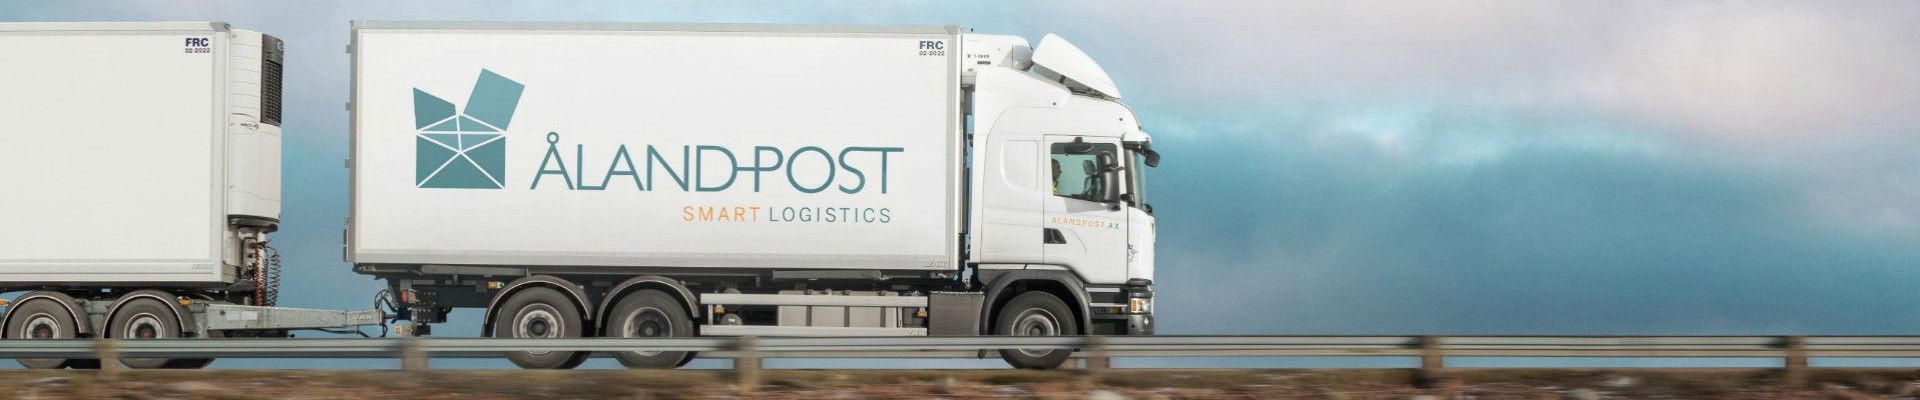 Åland Post rekka kuljetuksia